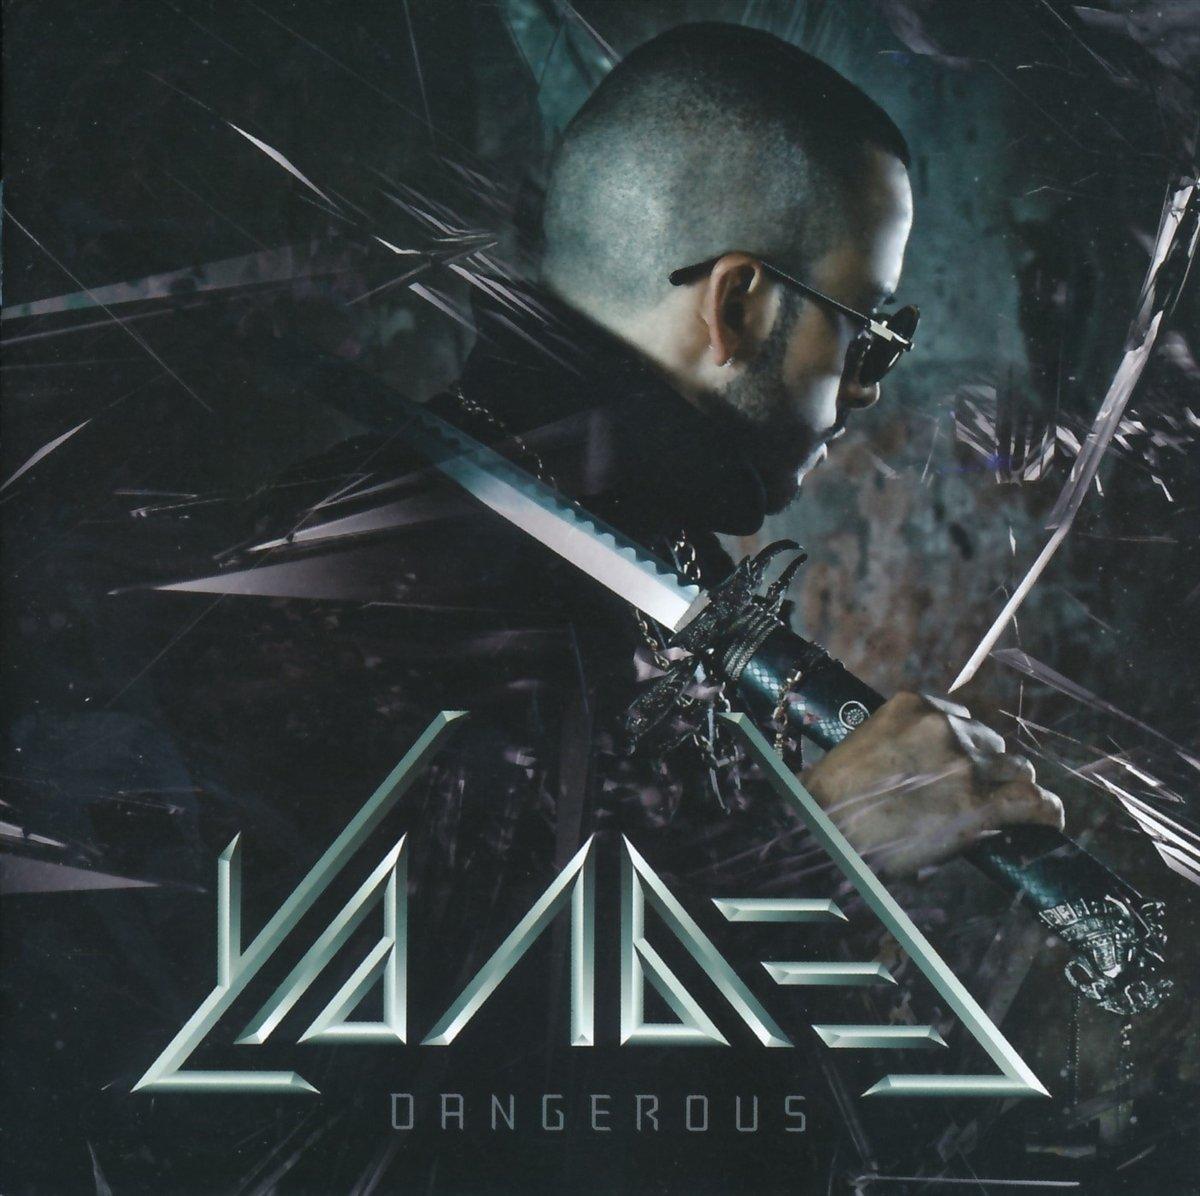 CD : Yandel - Dangerous (CD)